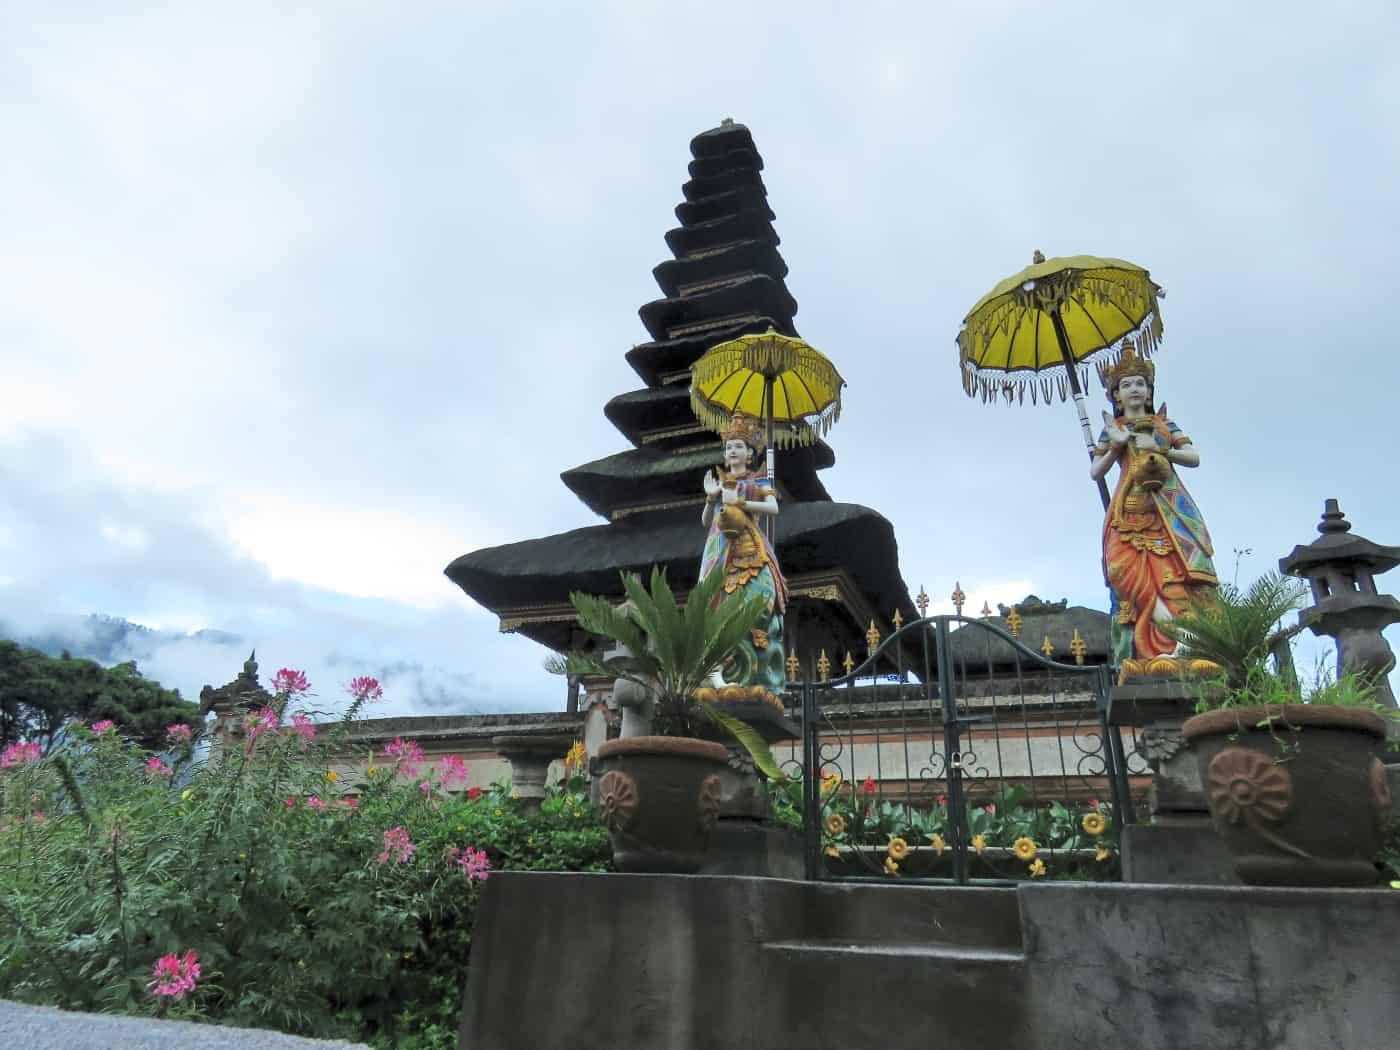 gogirlrun_bali_indonesien_privatetour_norden_Pura Ulun Danu Bratan_81